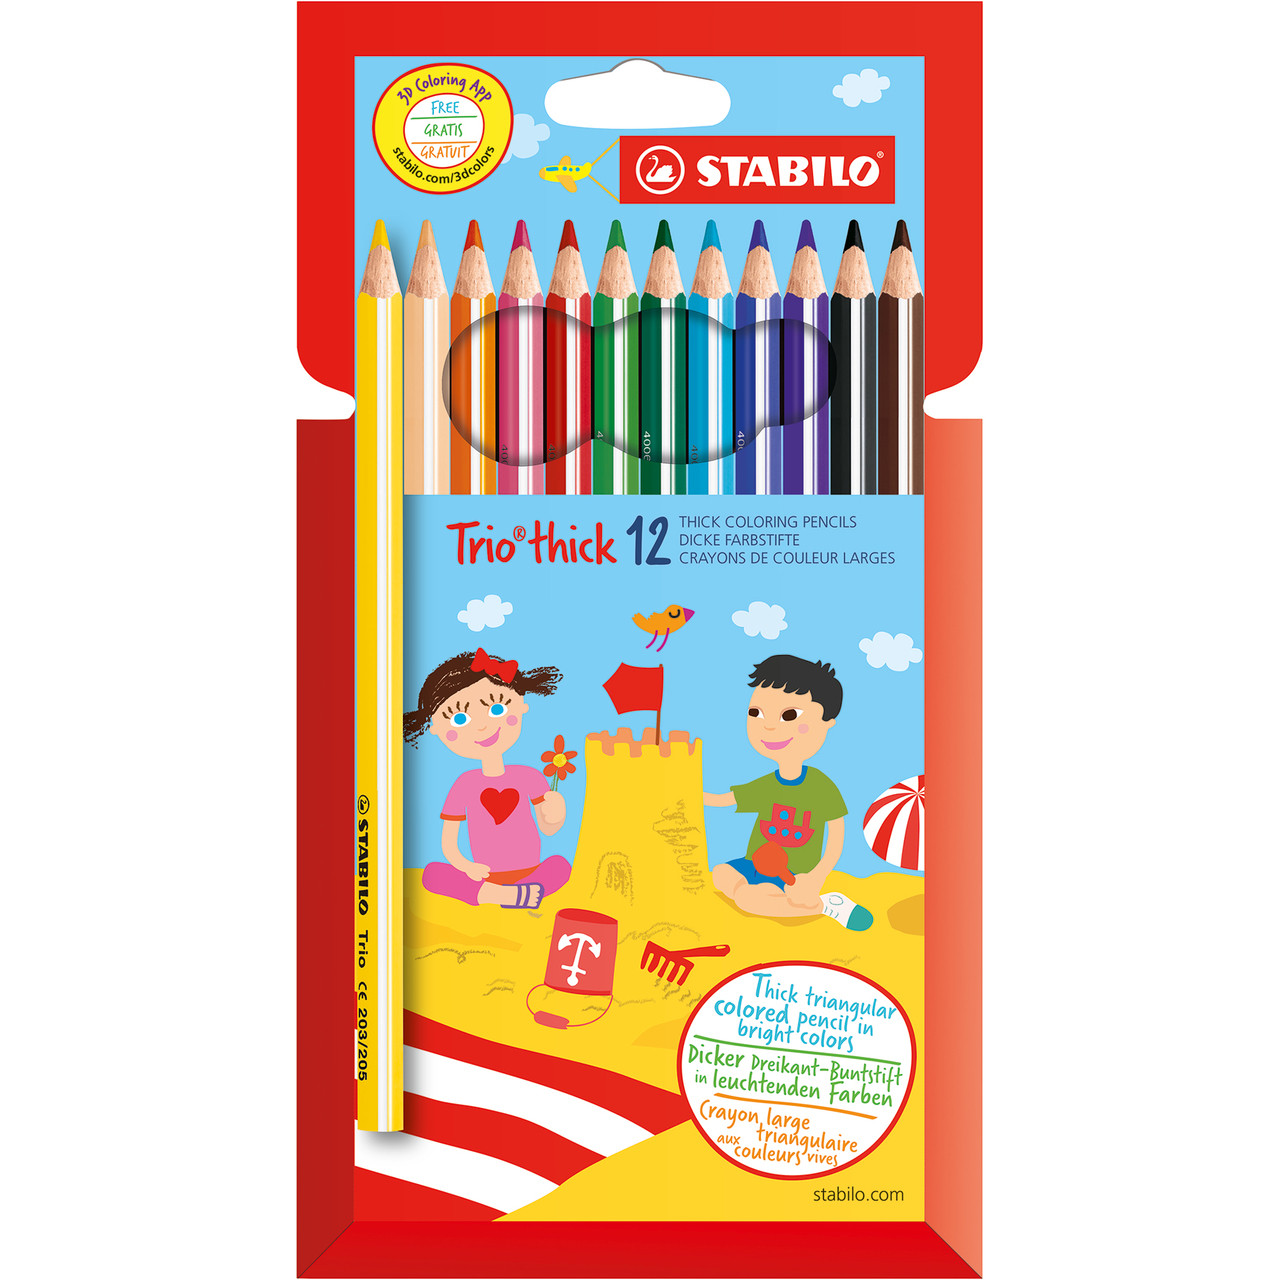 Stabilo TRIO Thick Pencil 12-color Set